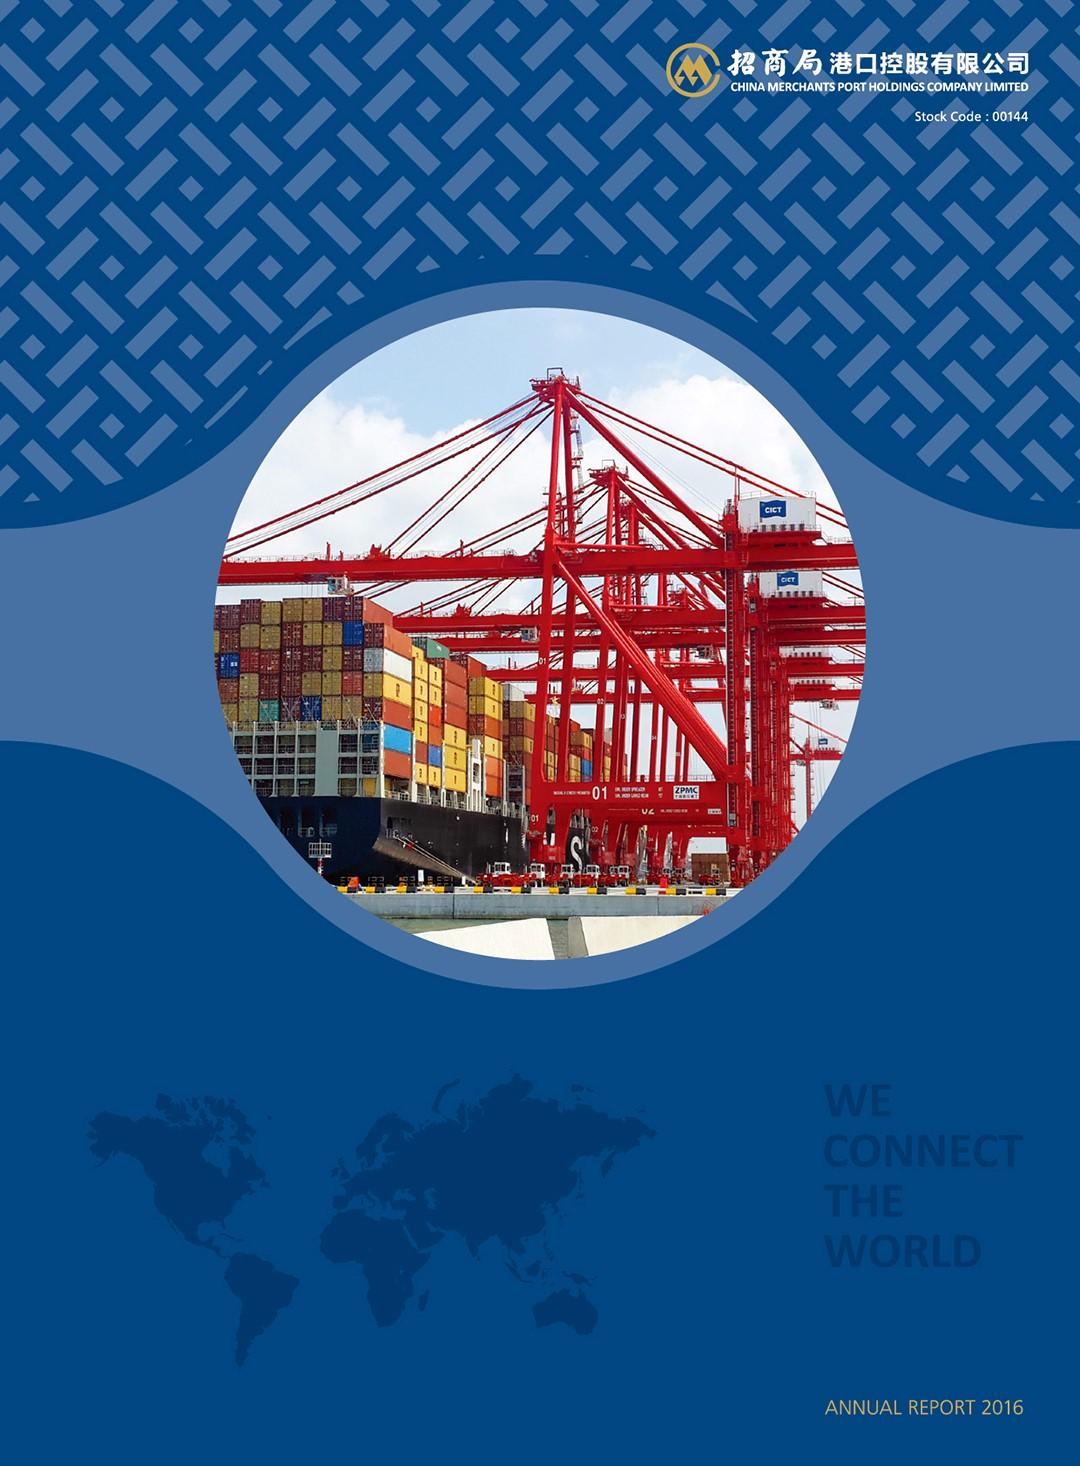 China Merchants Port Holdings Company Limited